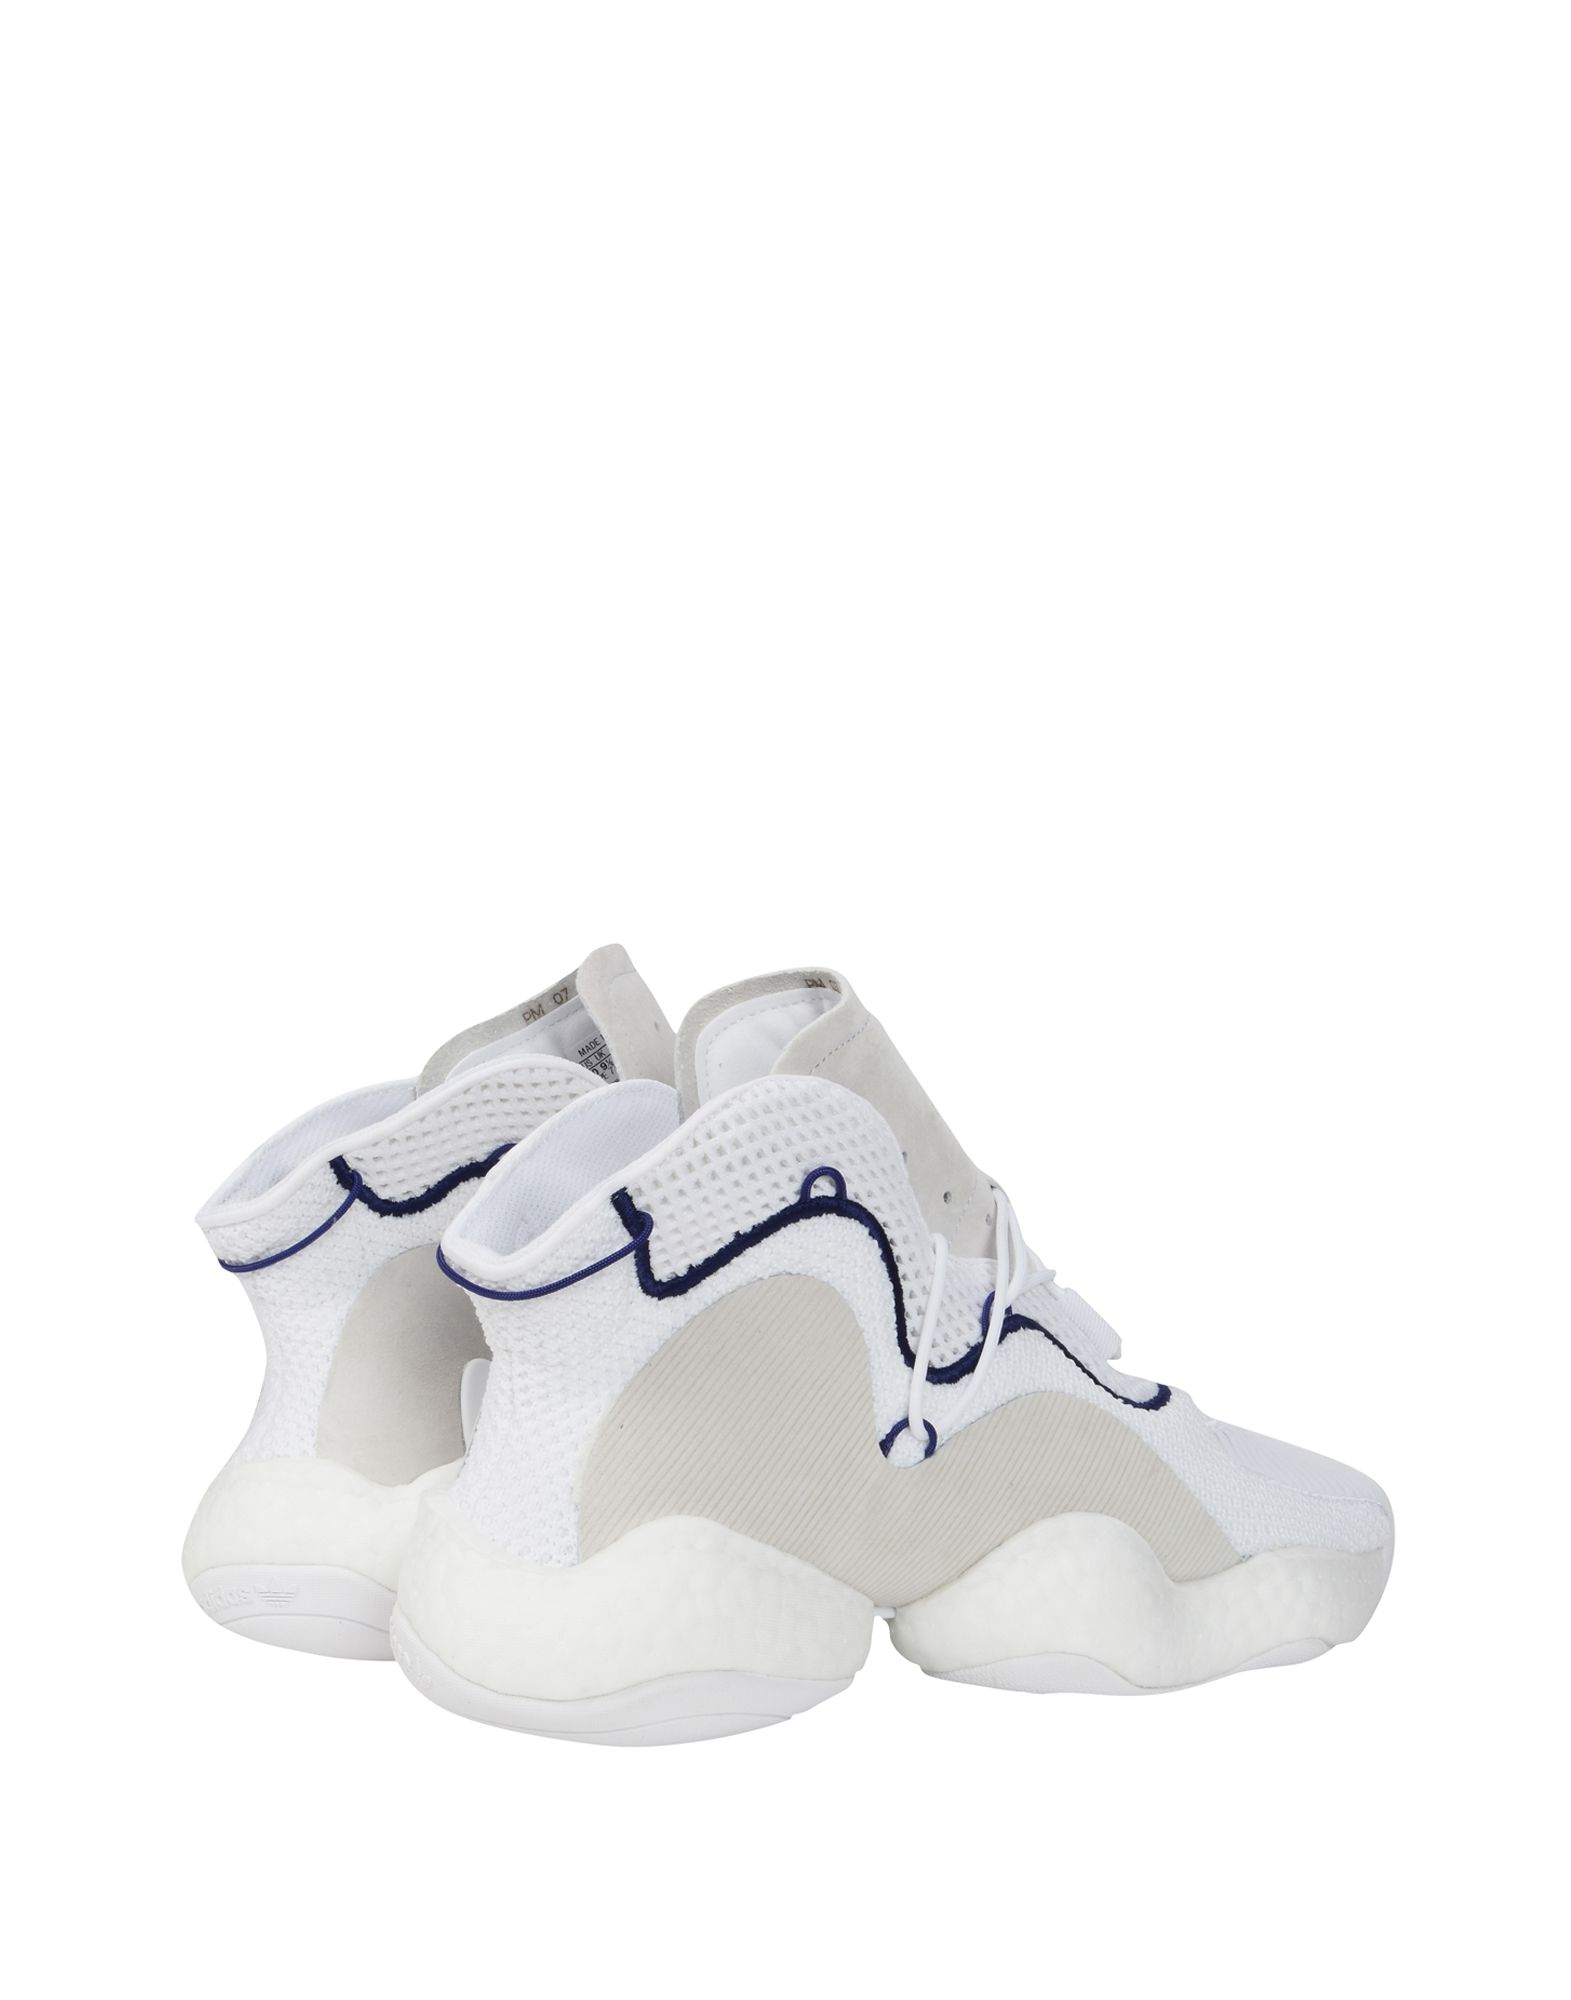 Adidas Originals Crazy Byw Lvl 1  11446495PB Heiße Schuhe Schuhe Schuhe 3dbe8b